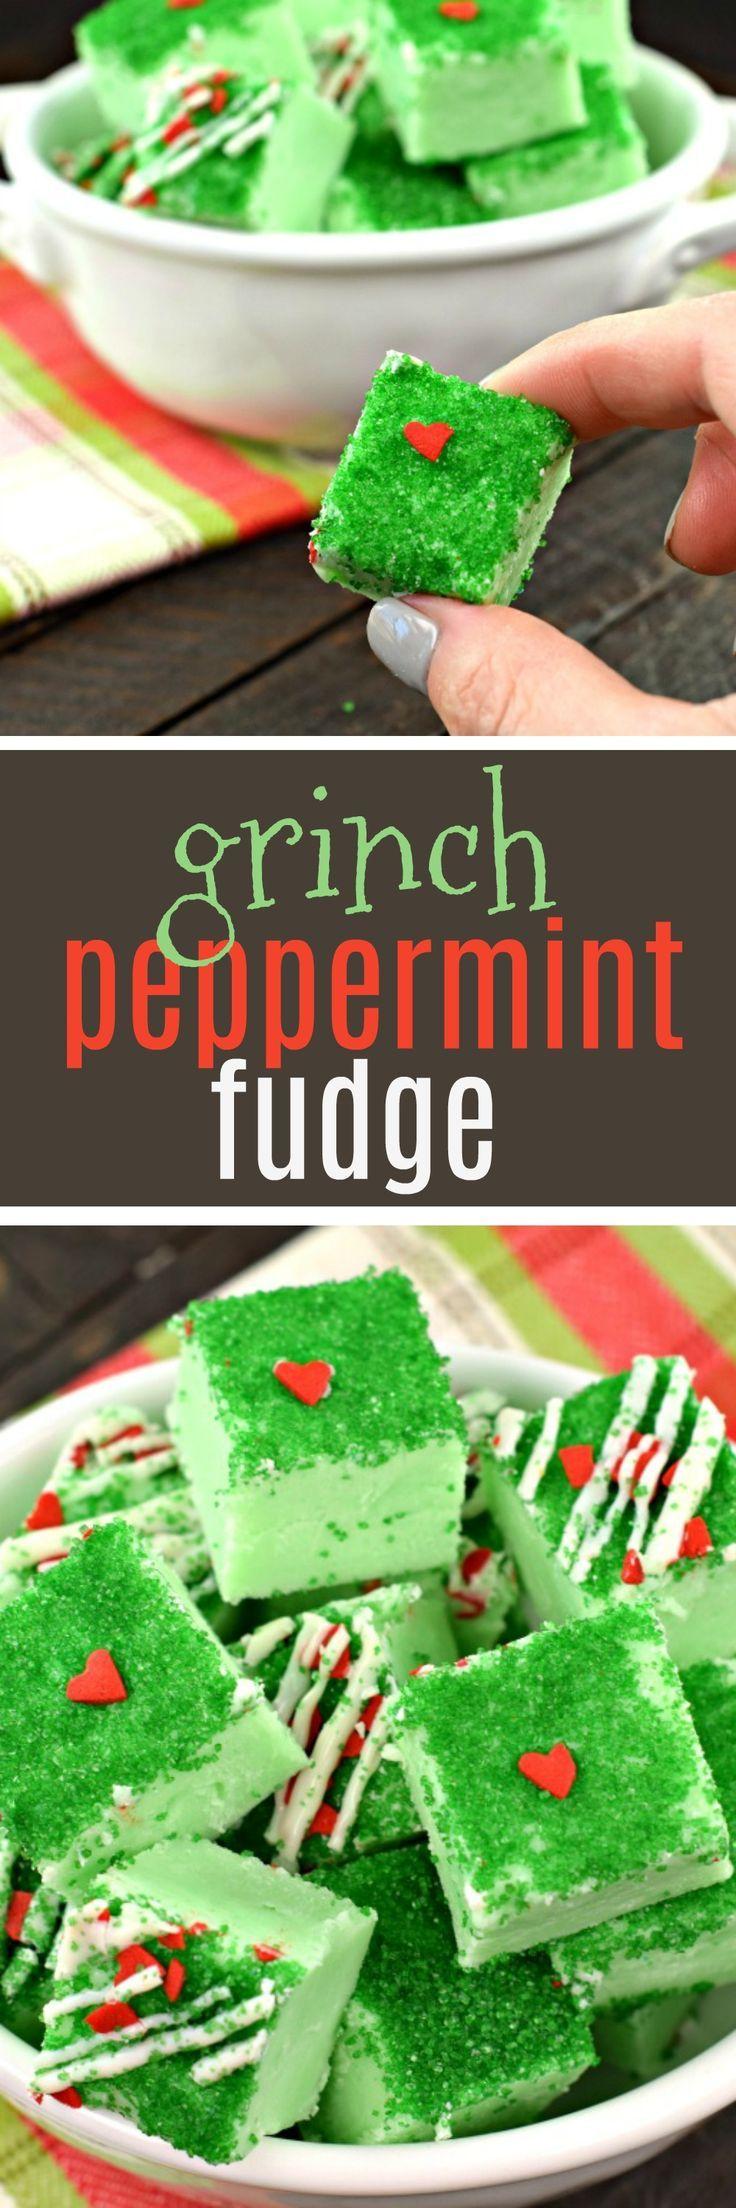 Grinch peppermint fudge.